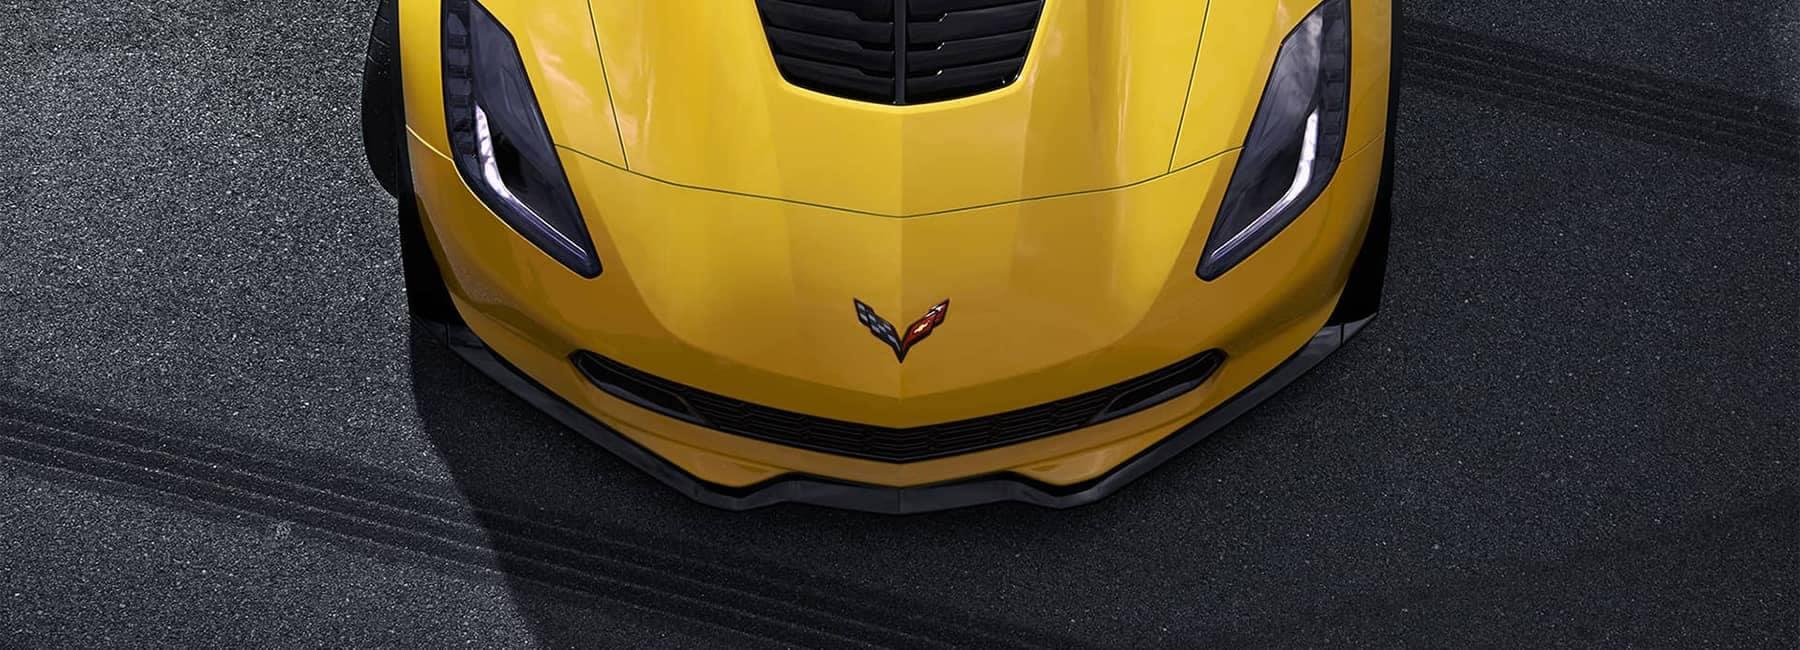 2019 Corvette Z06 Yellow Nose Top View